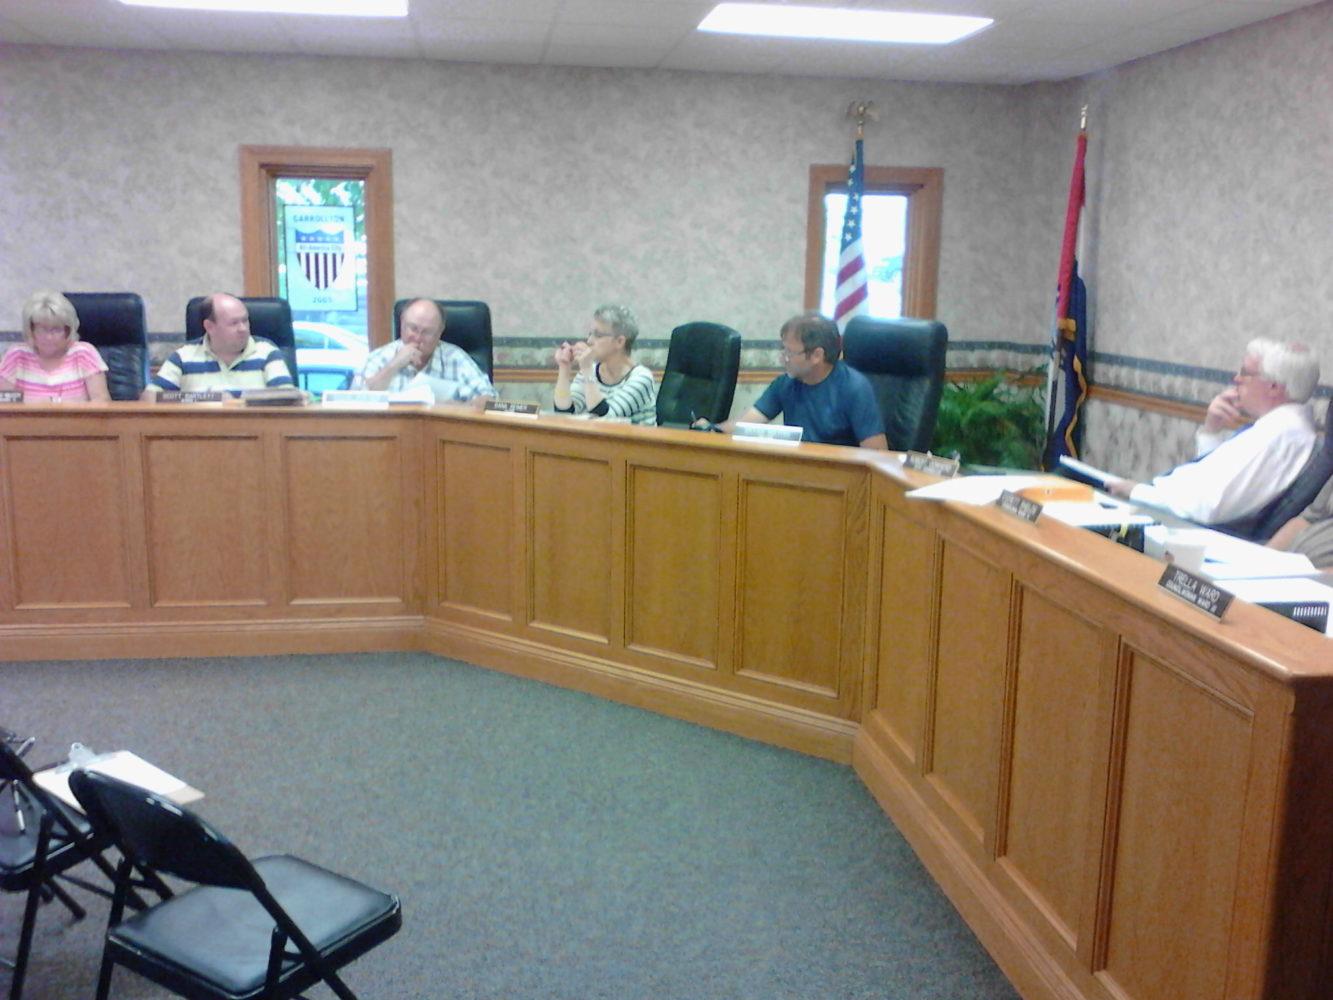 Carrollton Council moves forward on electric plant upgrade, head start renovation